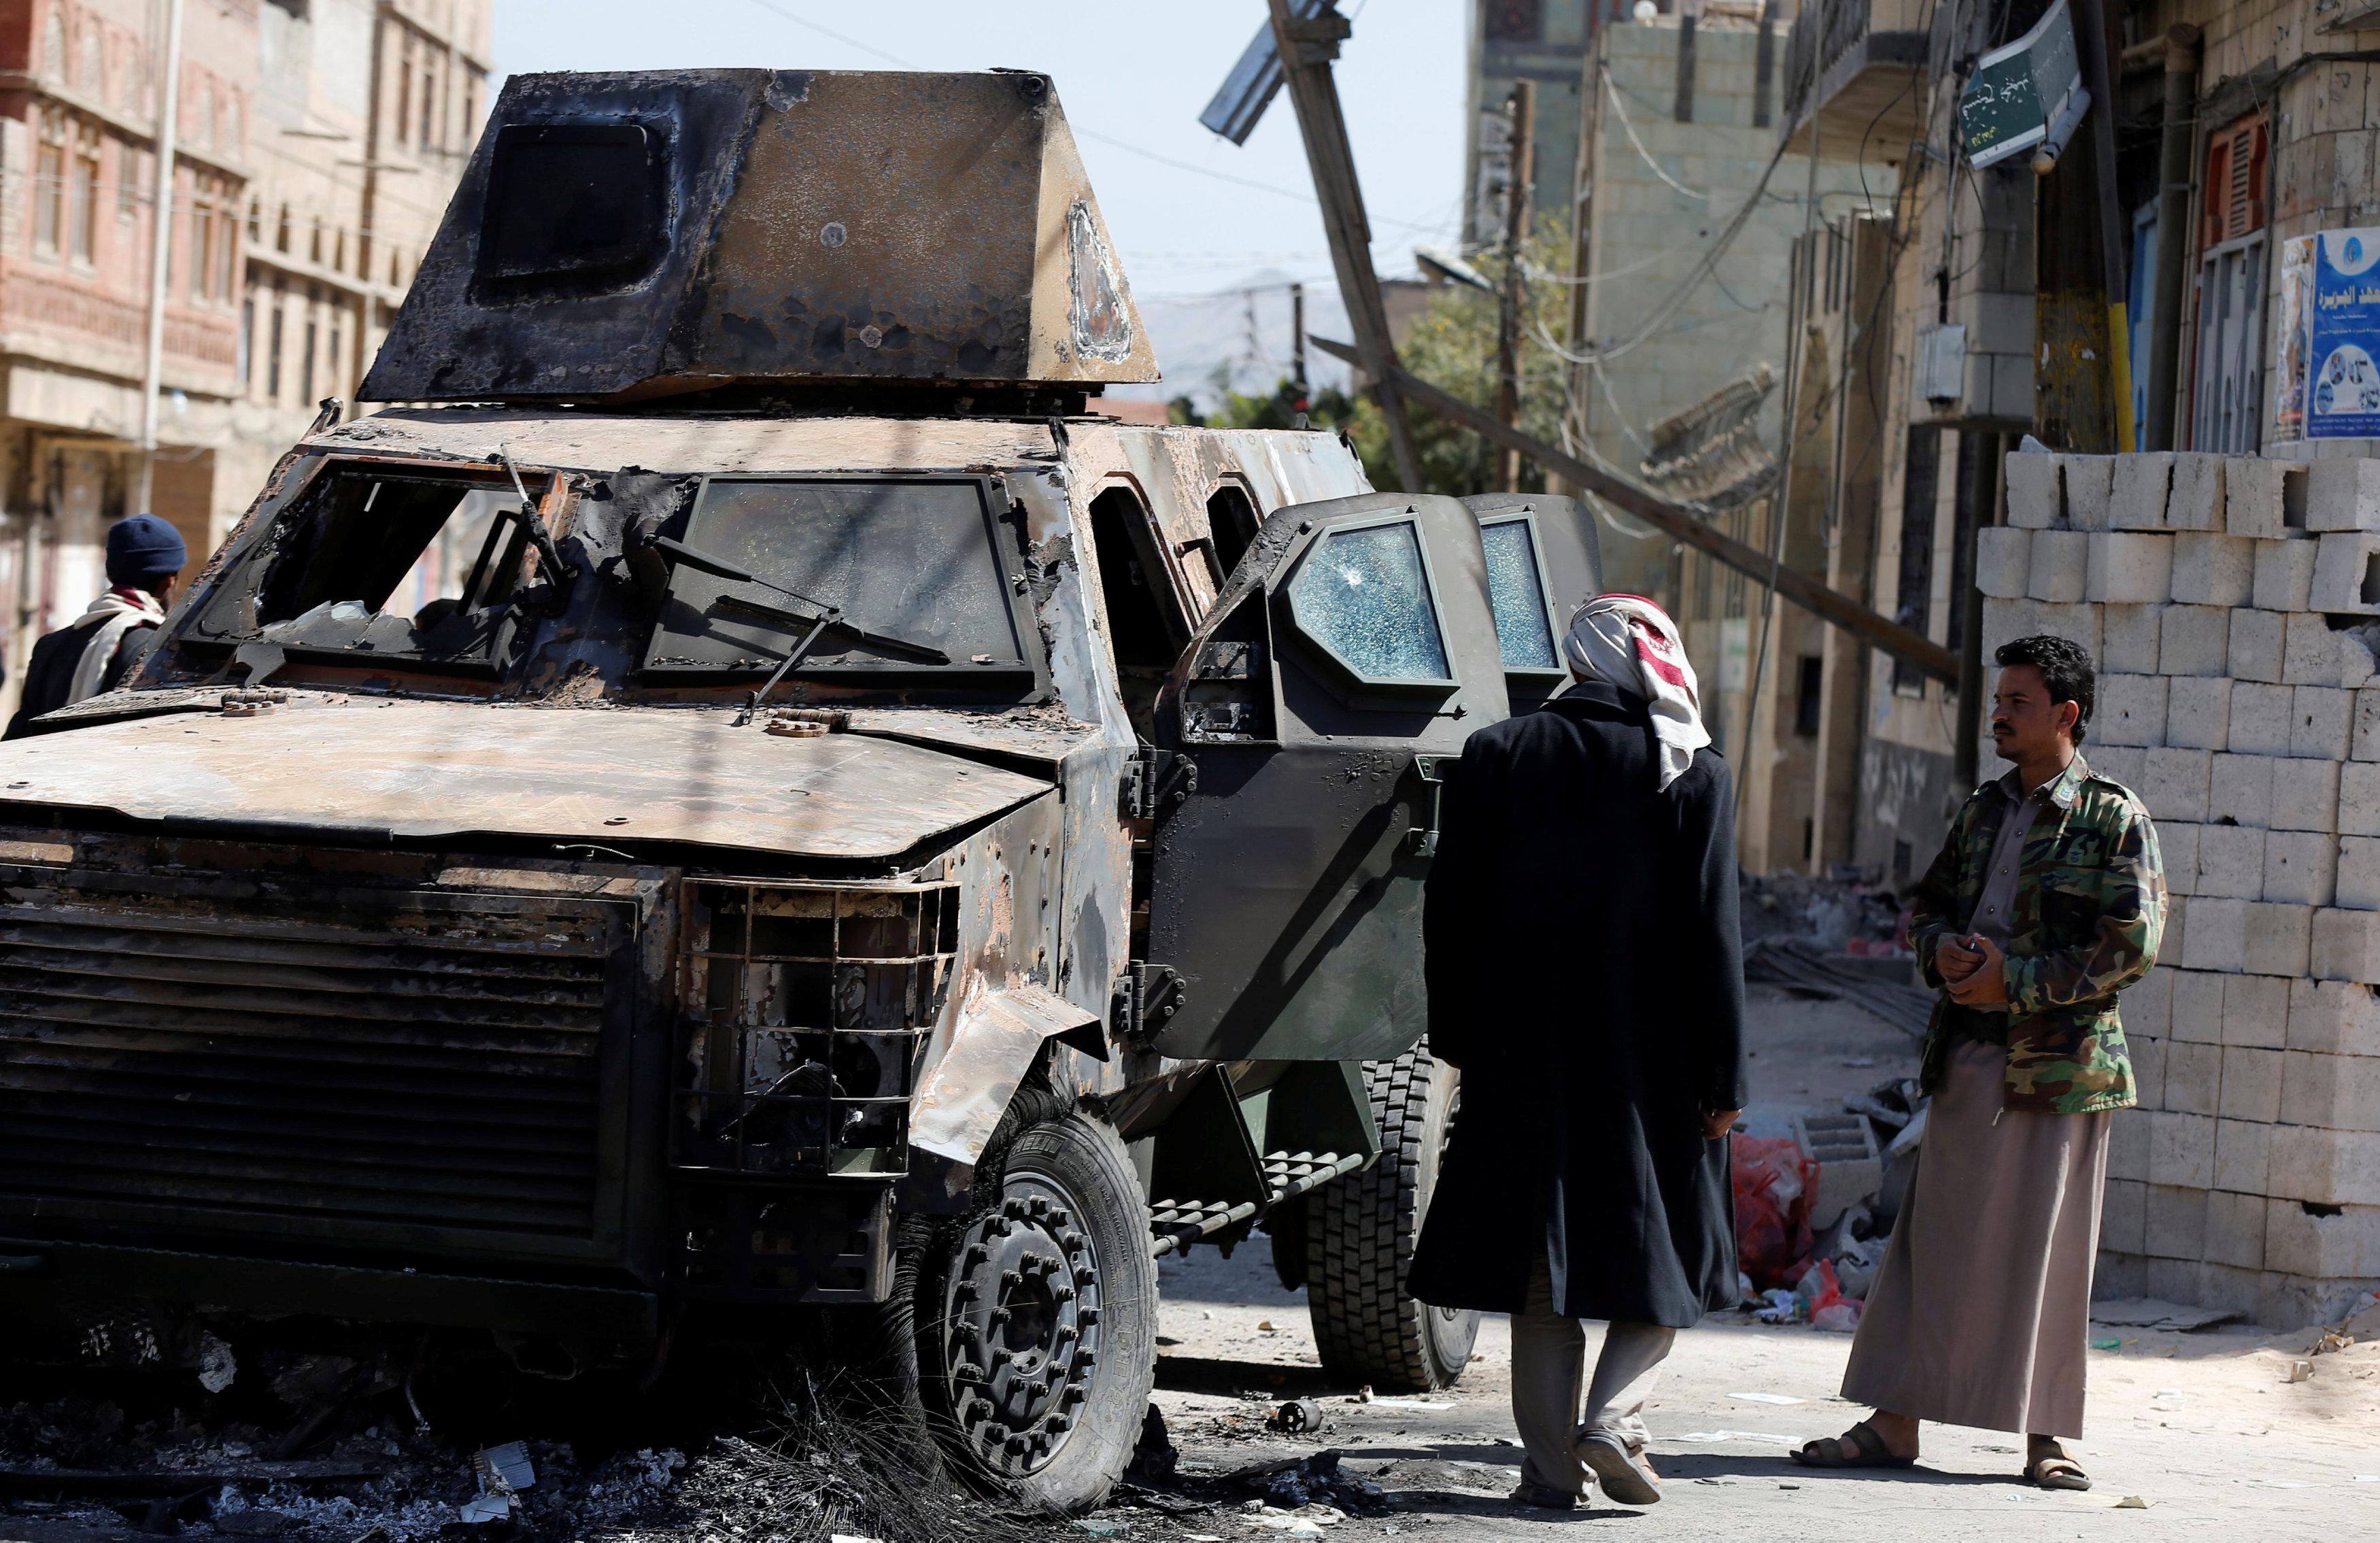 Yemen's Houthi rebels tighten grip on Sanaa